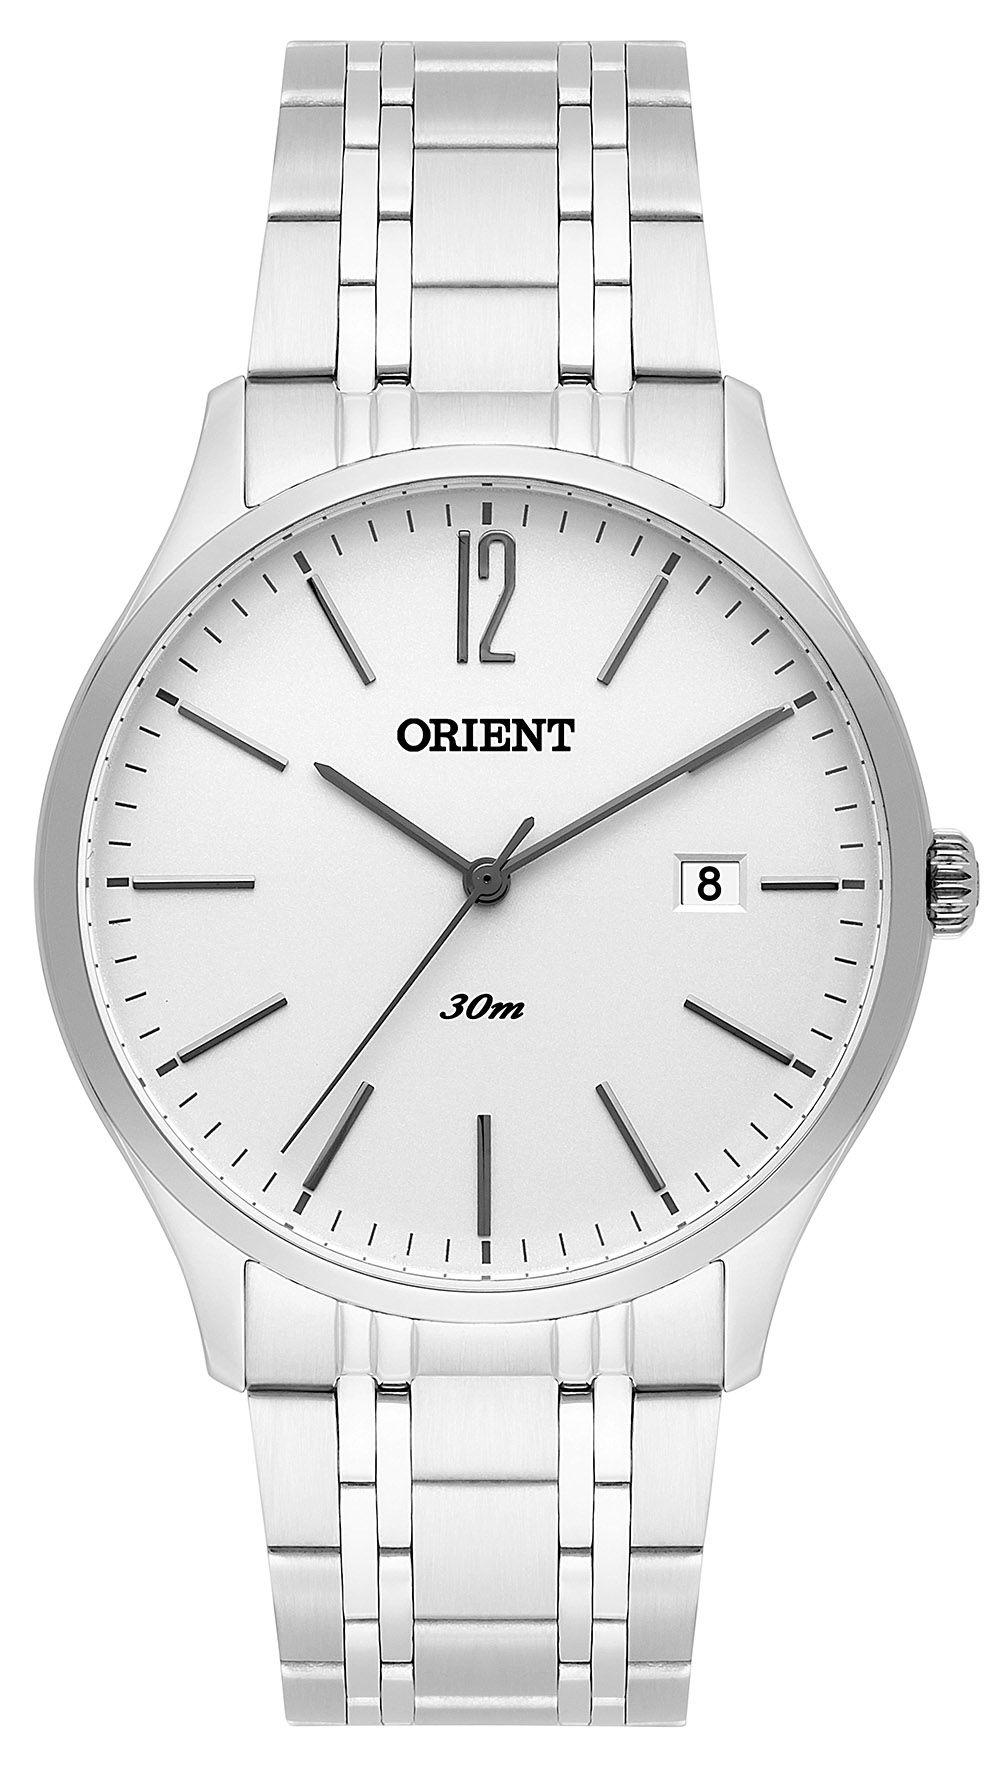 Relógio Orient Masculino MBSS1310-S2SX Prata